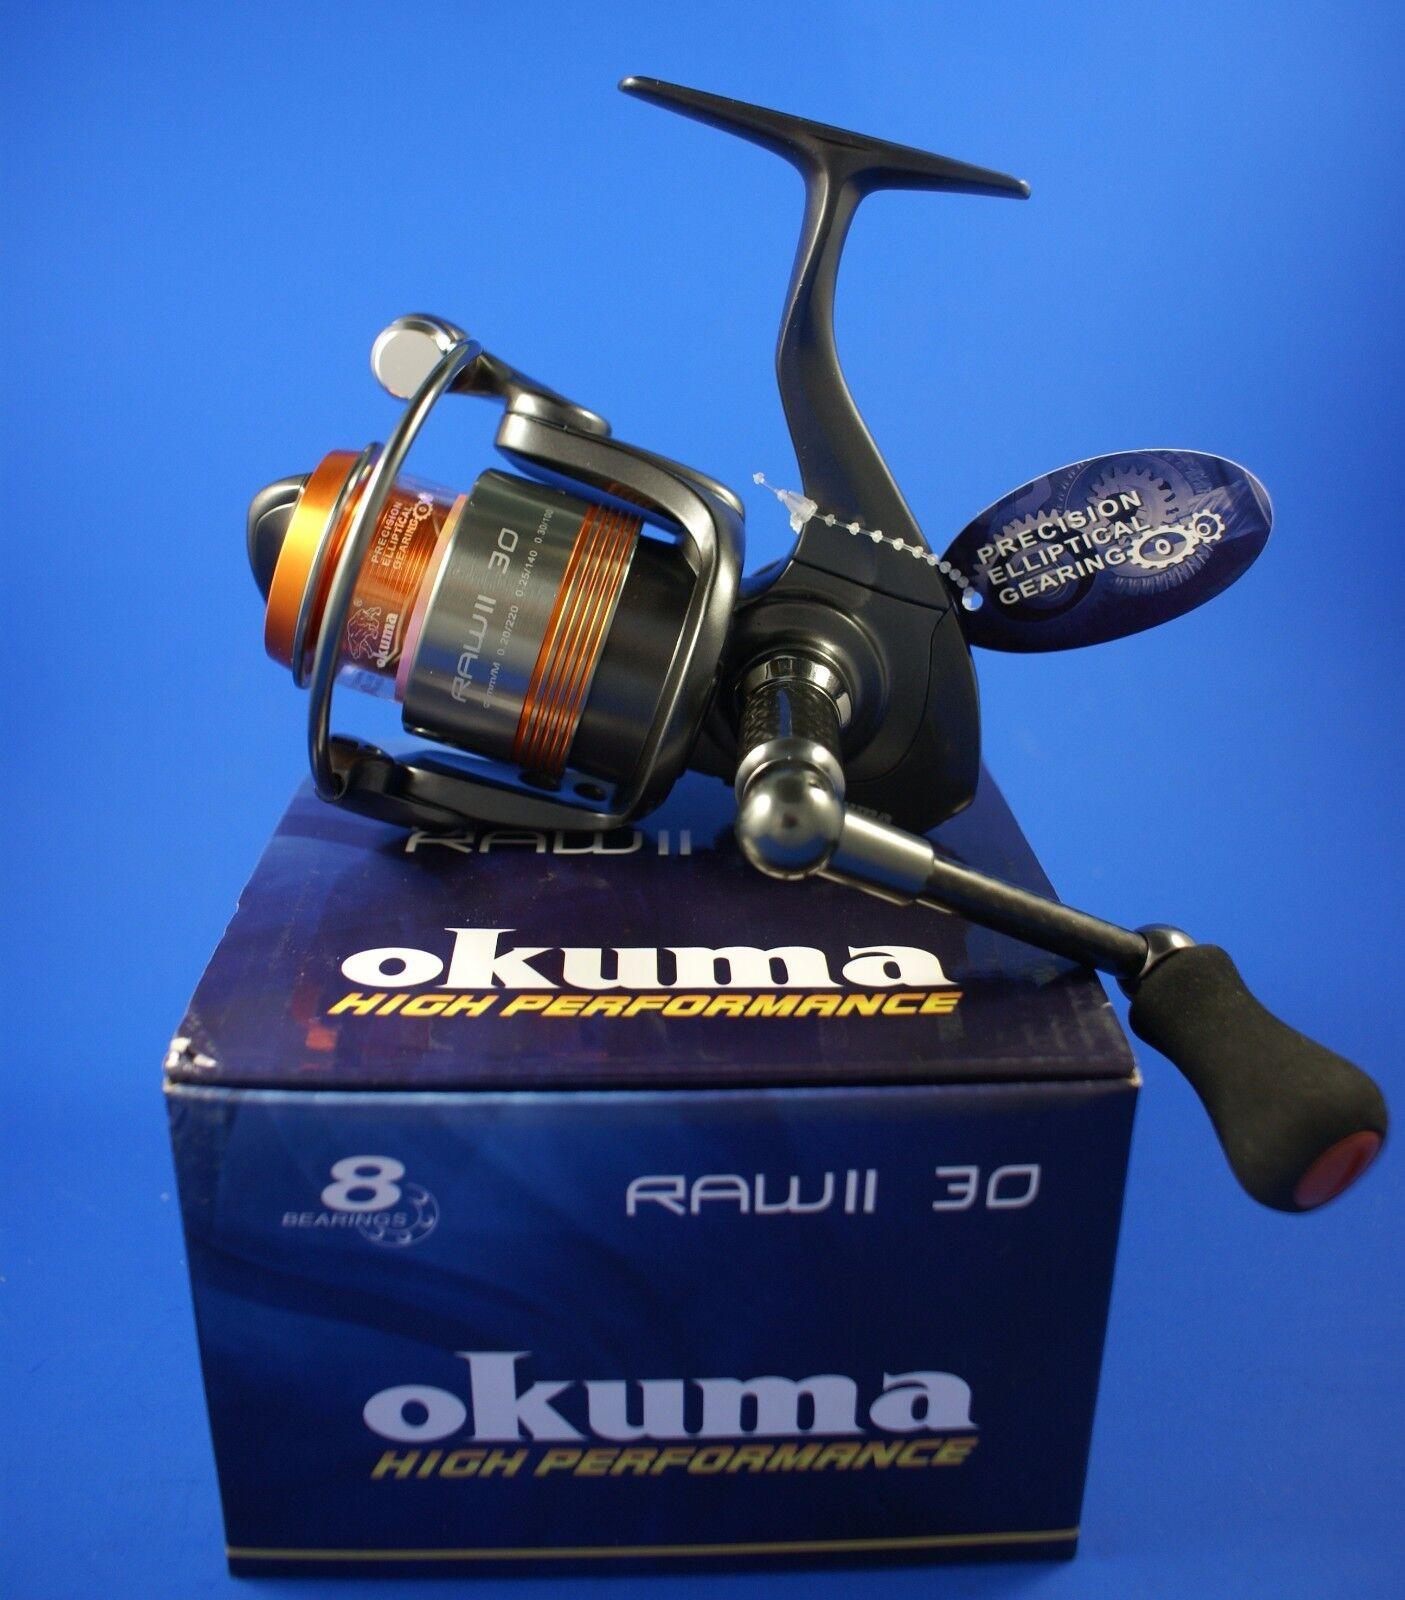 Okuma RAW II 30 FD 7+1BB 5.0:1 Drag 43968 Front Drag 5.0:1 Fishing Reel e3967e